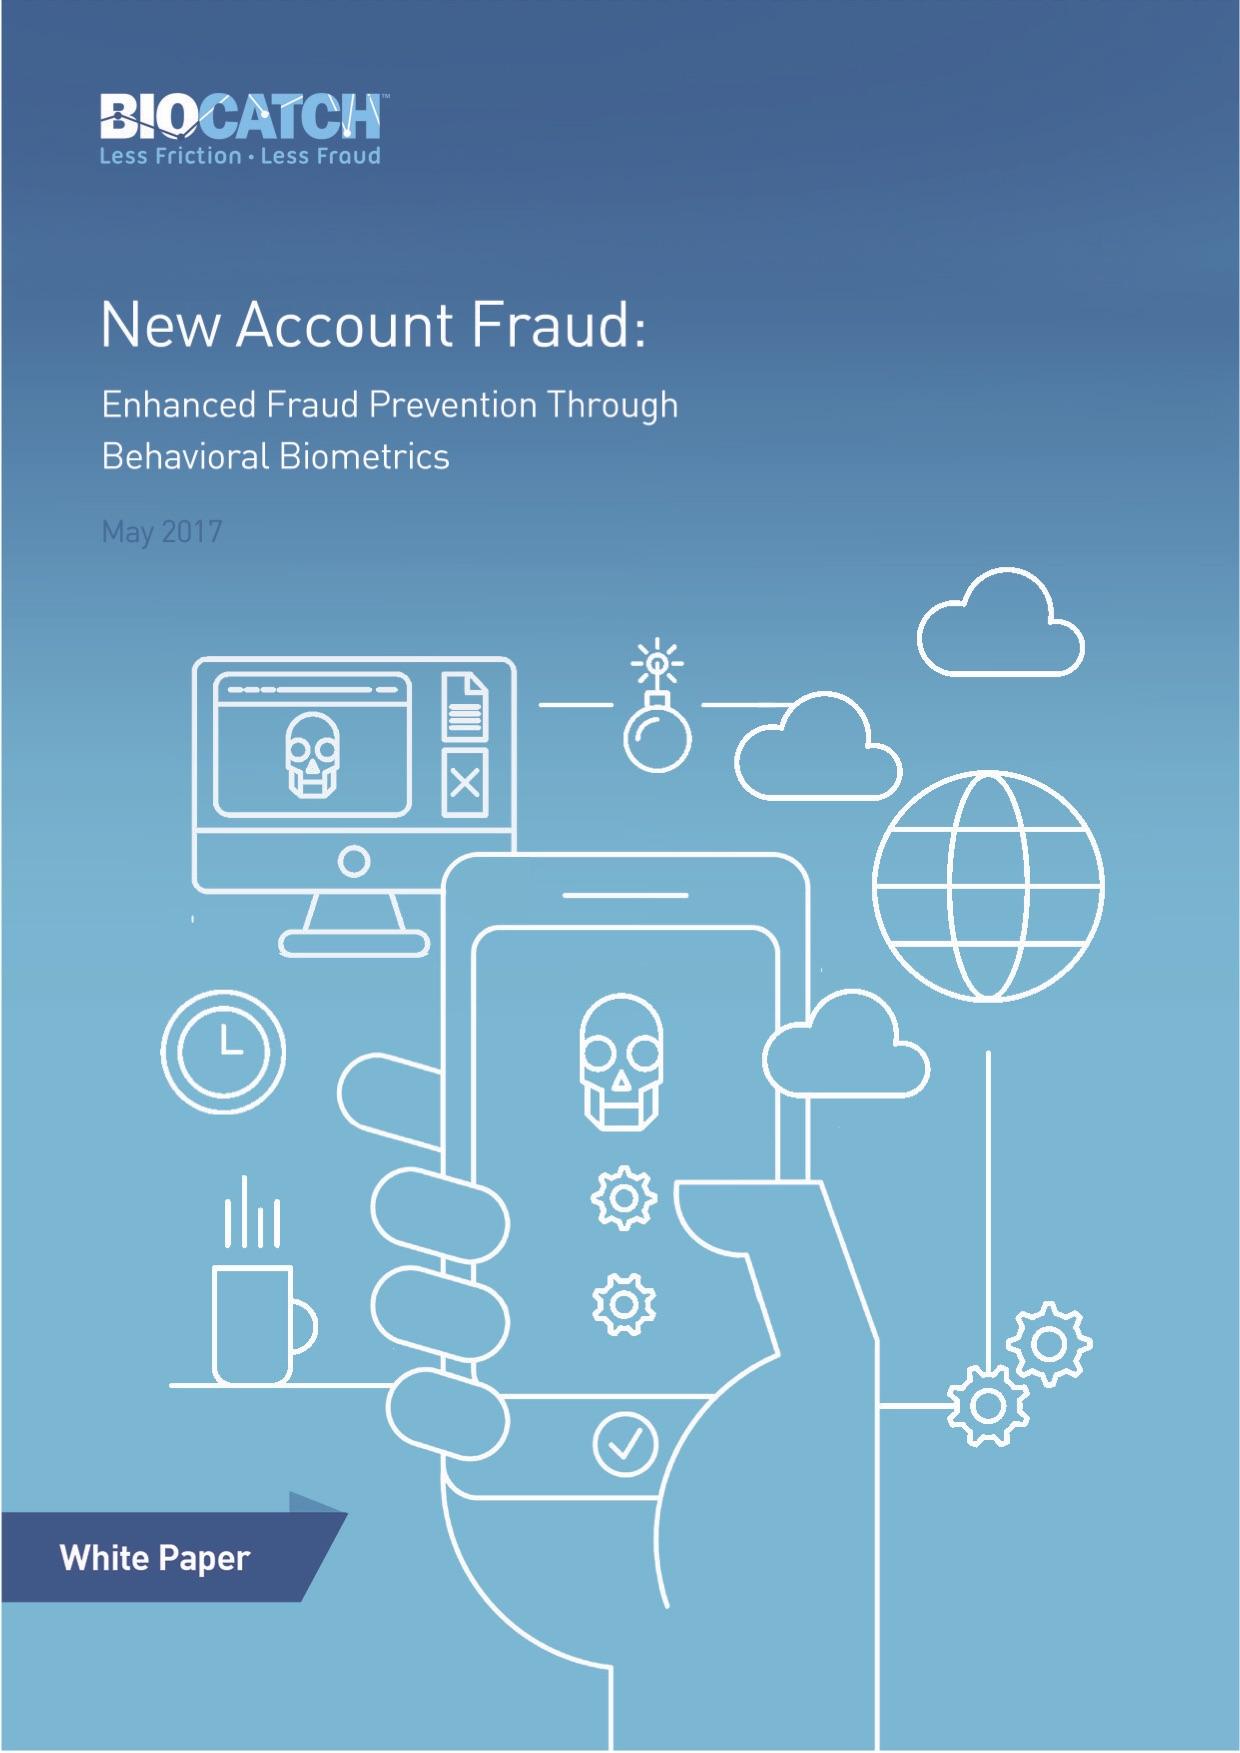 BioCatch_New_Account_Fraud_5 (1).jpg